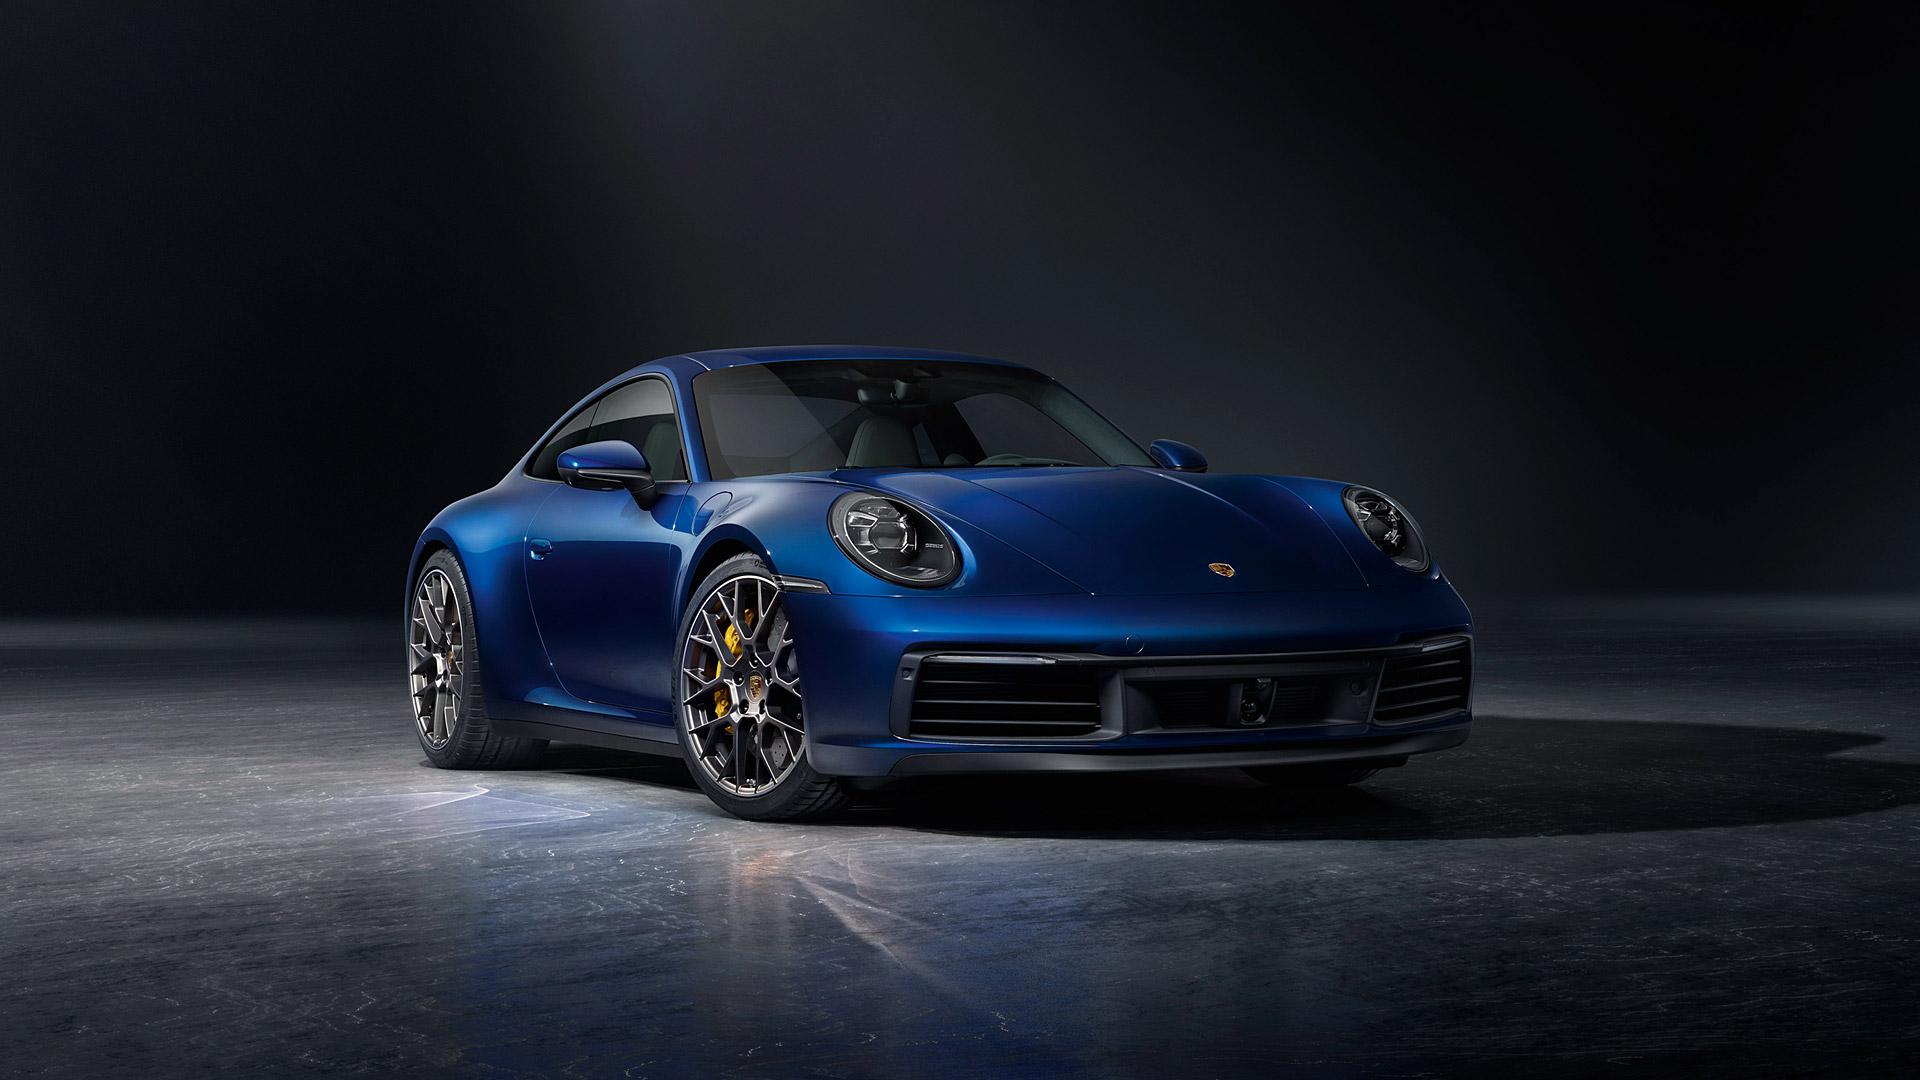 2019 Porsche 911 Carrera 4S Wallpapers Specs Videos   4K HD 1920x1080